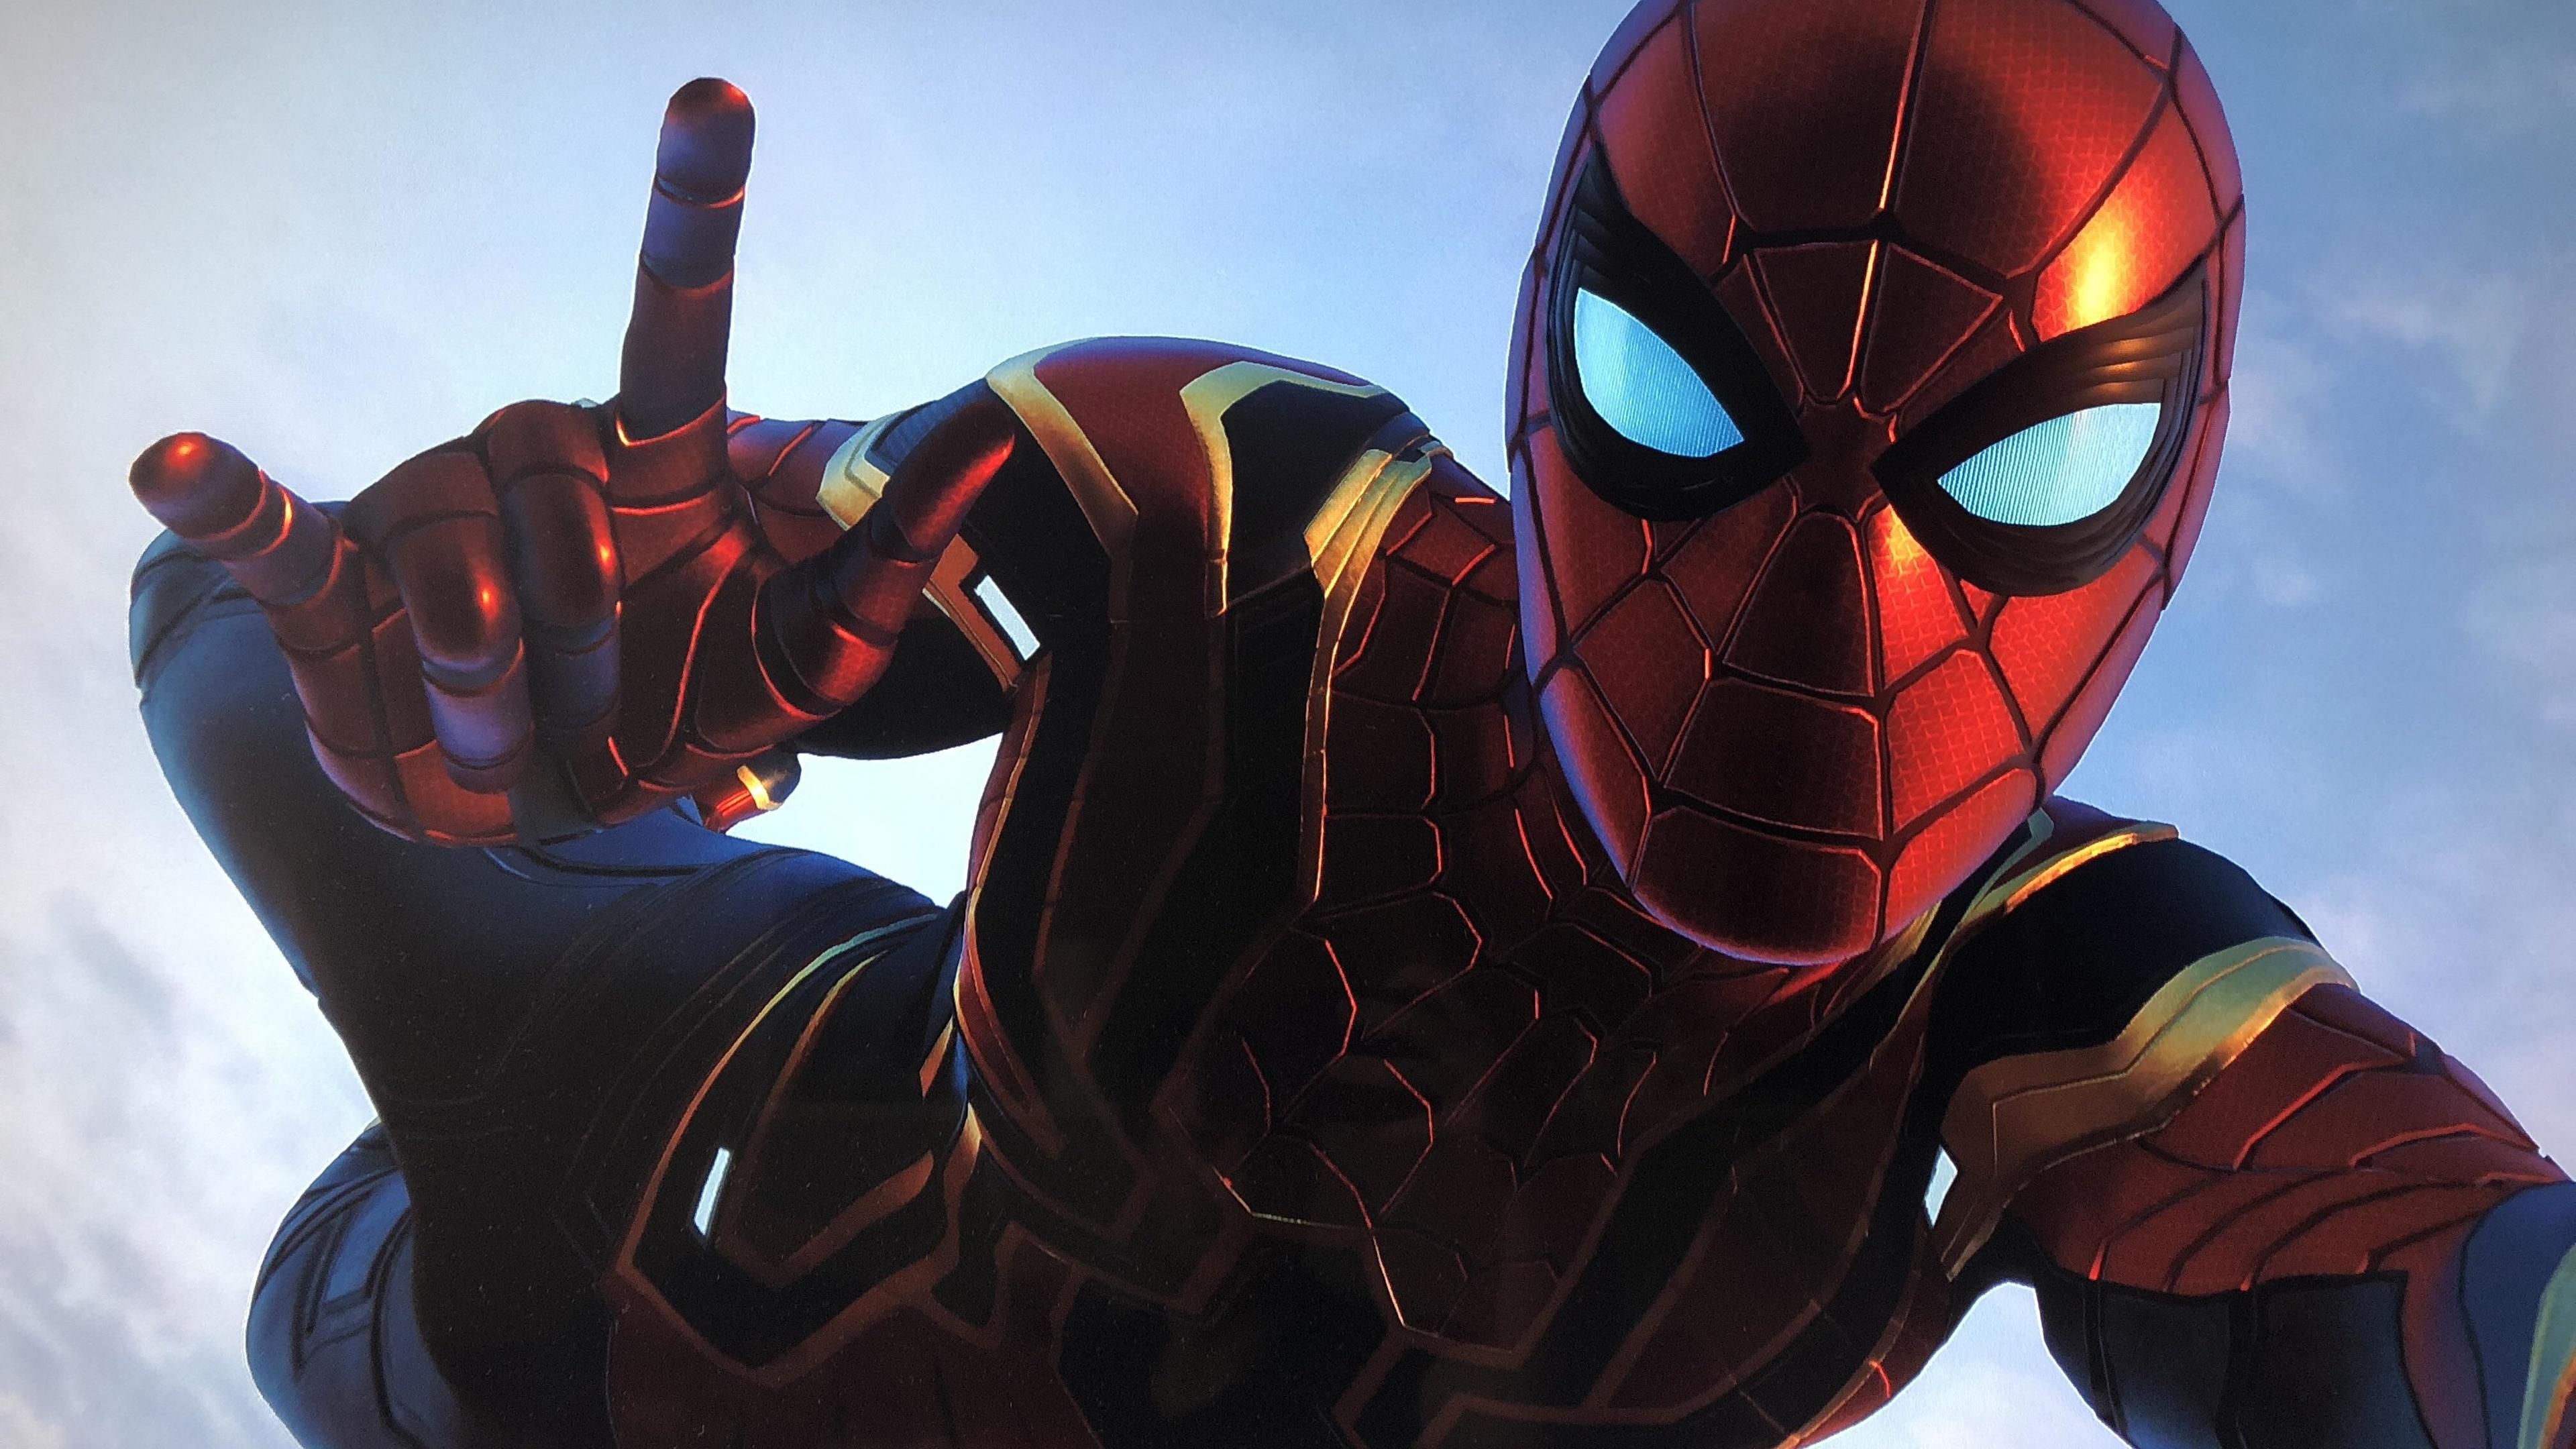 spiderman iron stark suit superheroes wallpapers